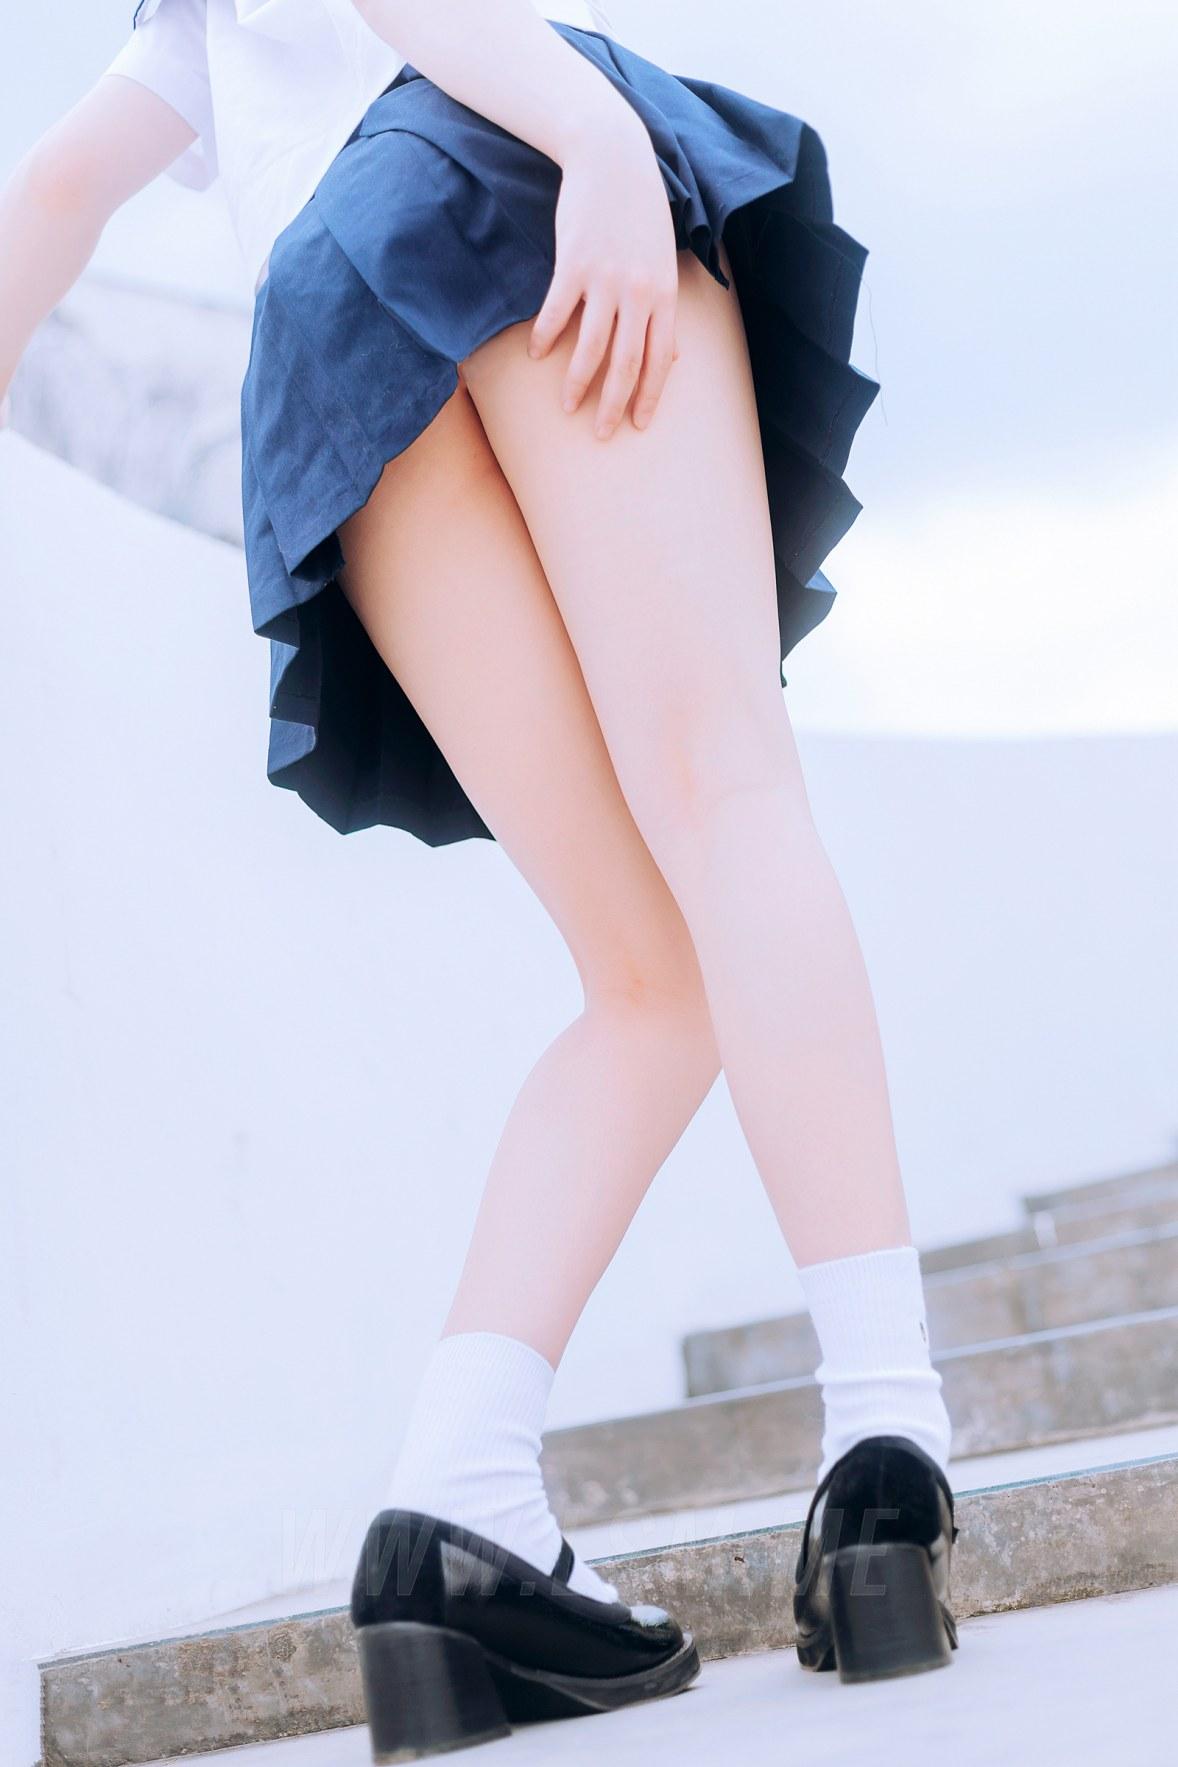 MTYH 喵糖映画 Vol.446 绿意jk制服 - 2